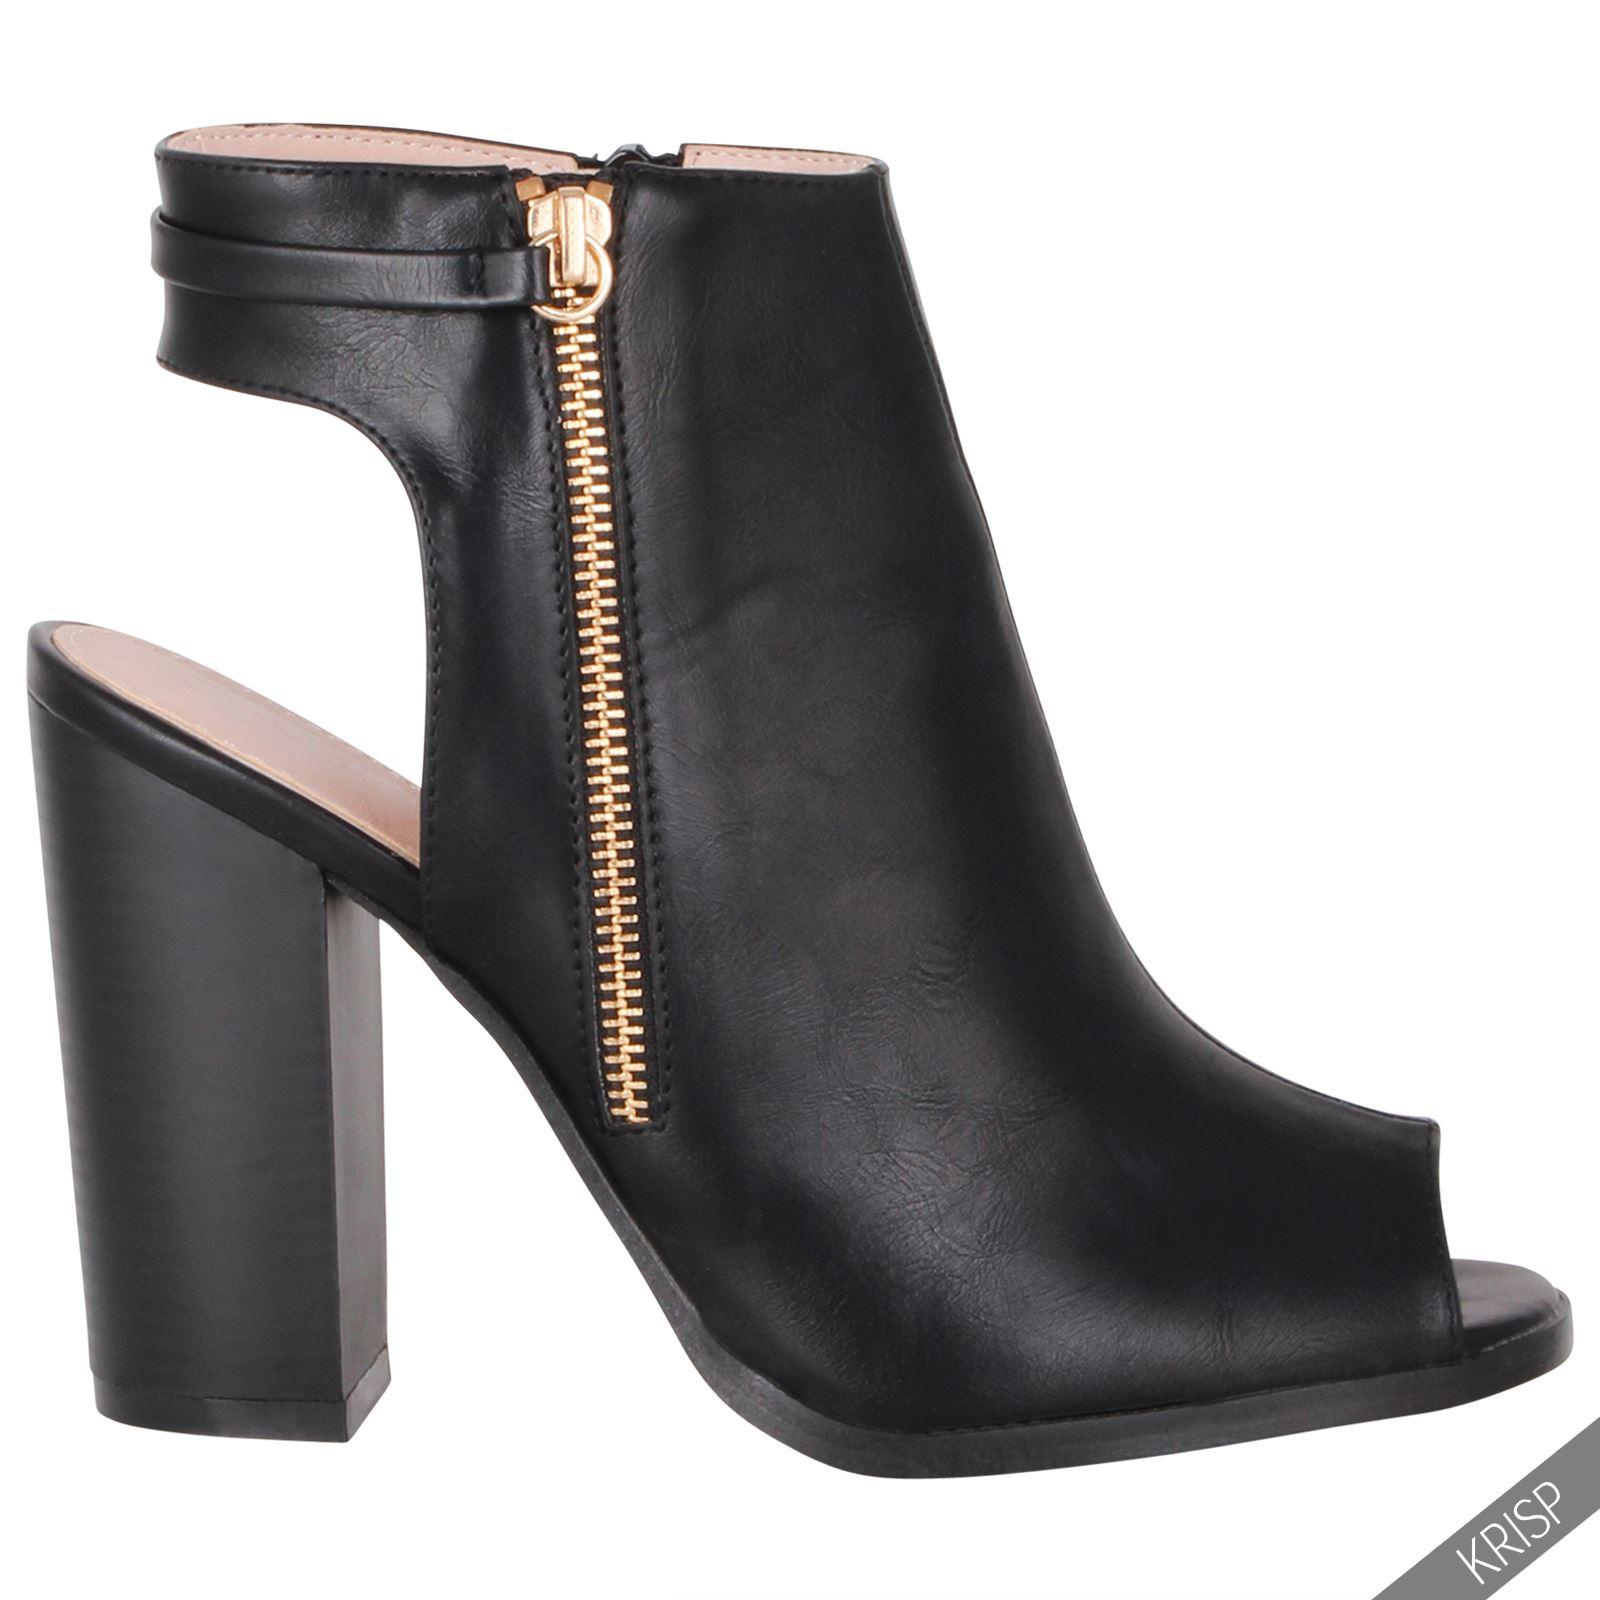 Womens Fashion Cut Open Peep Toe Shoes Block High Heel Summer Ankle Boots Sz 3-8 | EBay